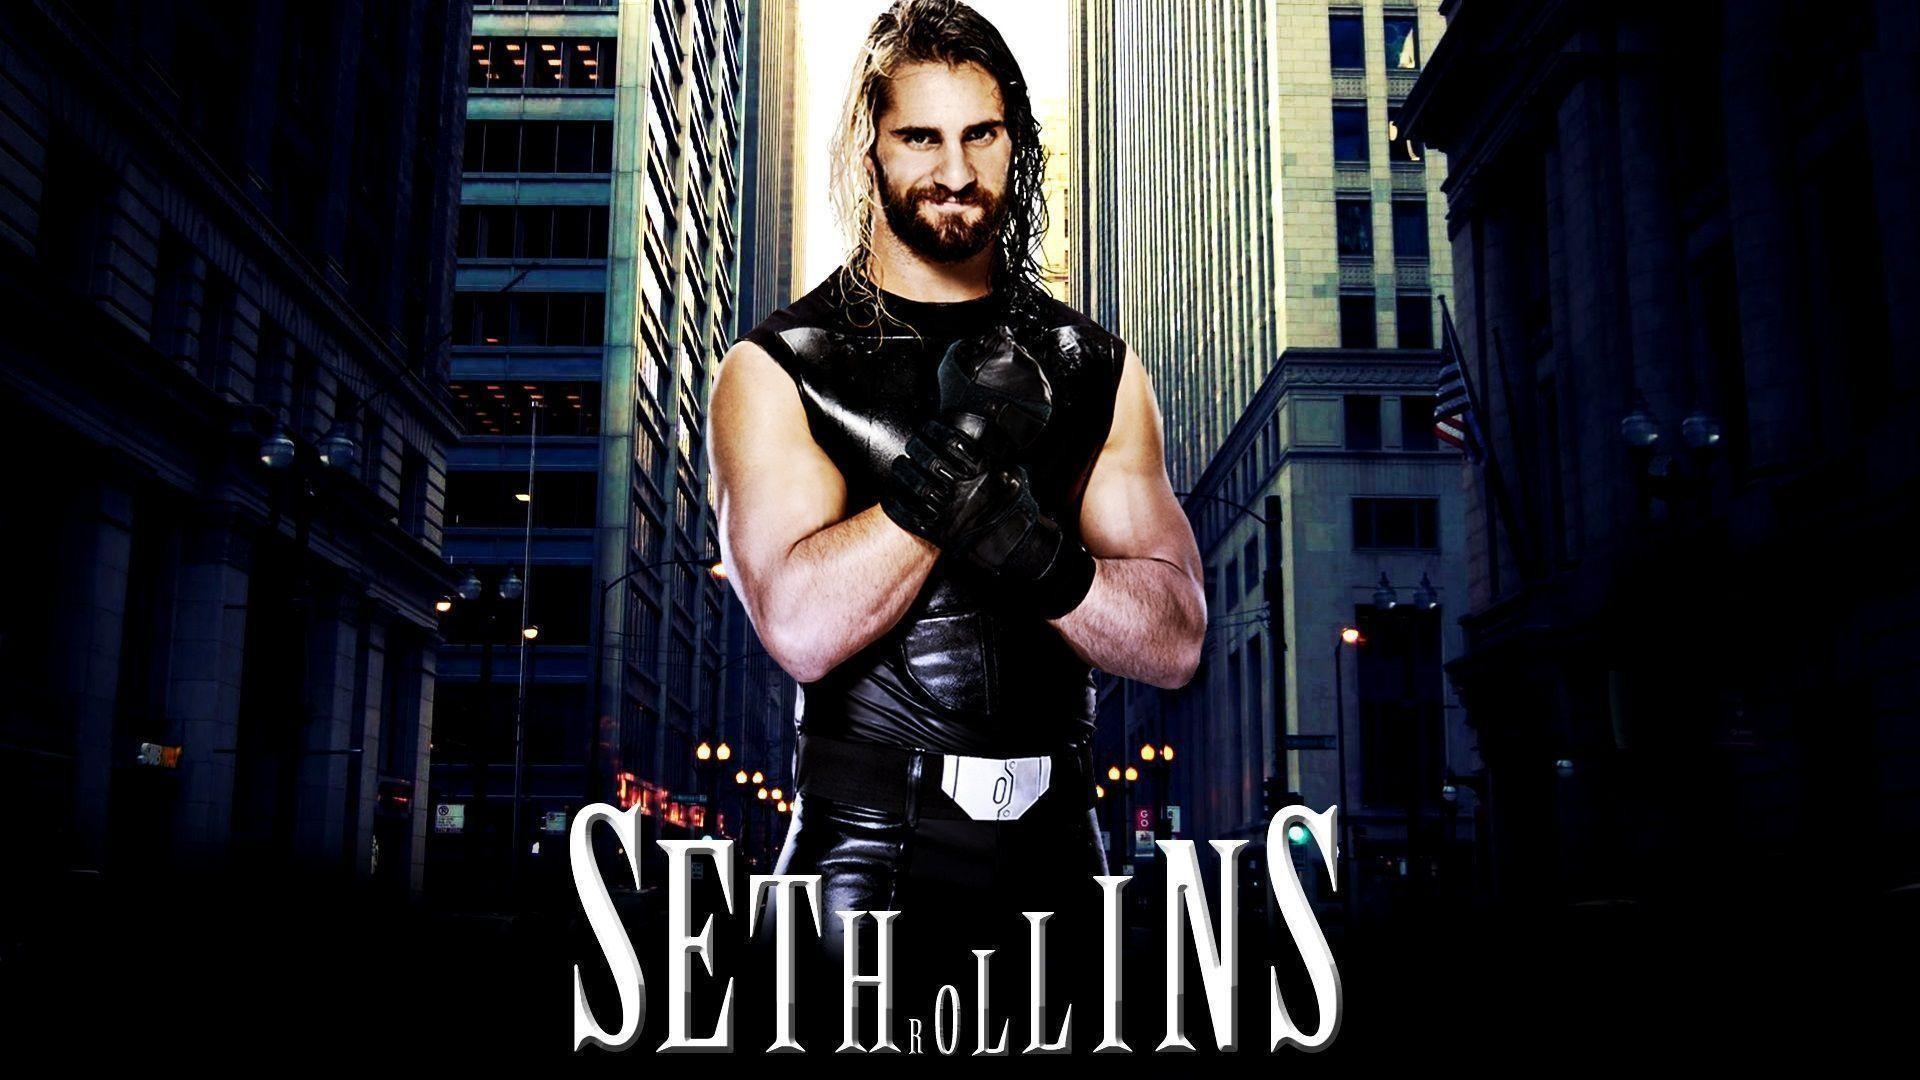 Seth Rollins HD Wallpaper